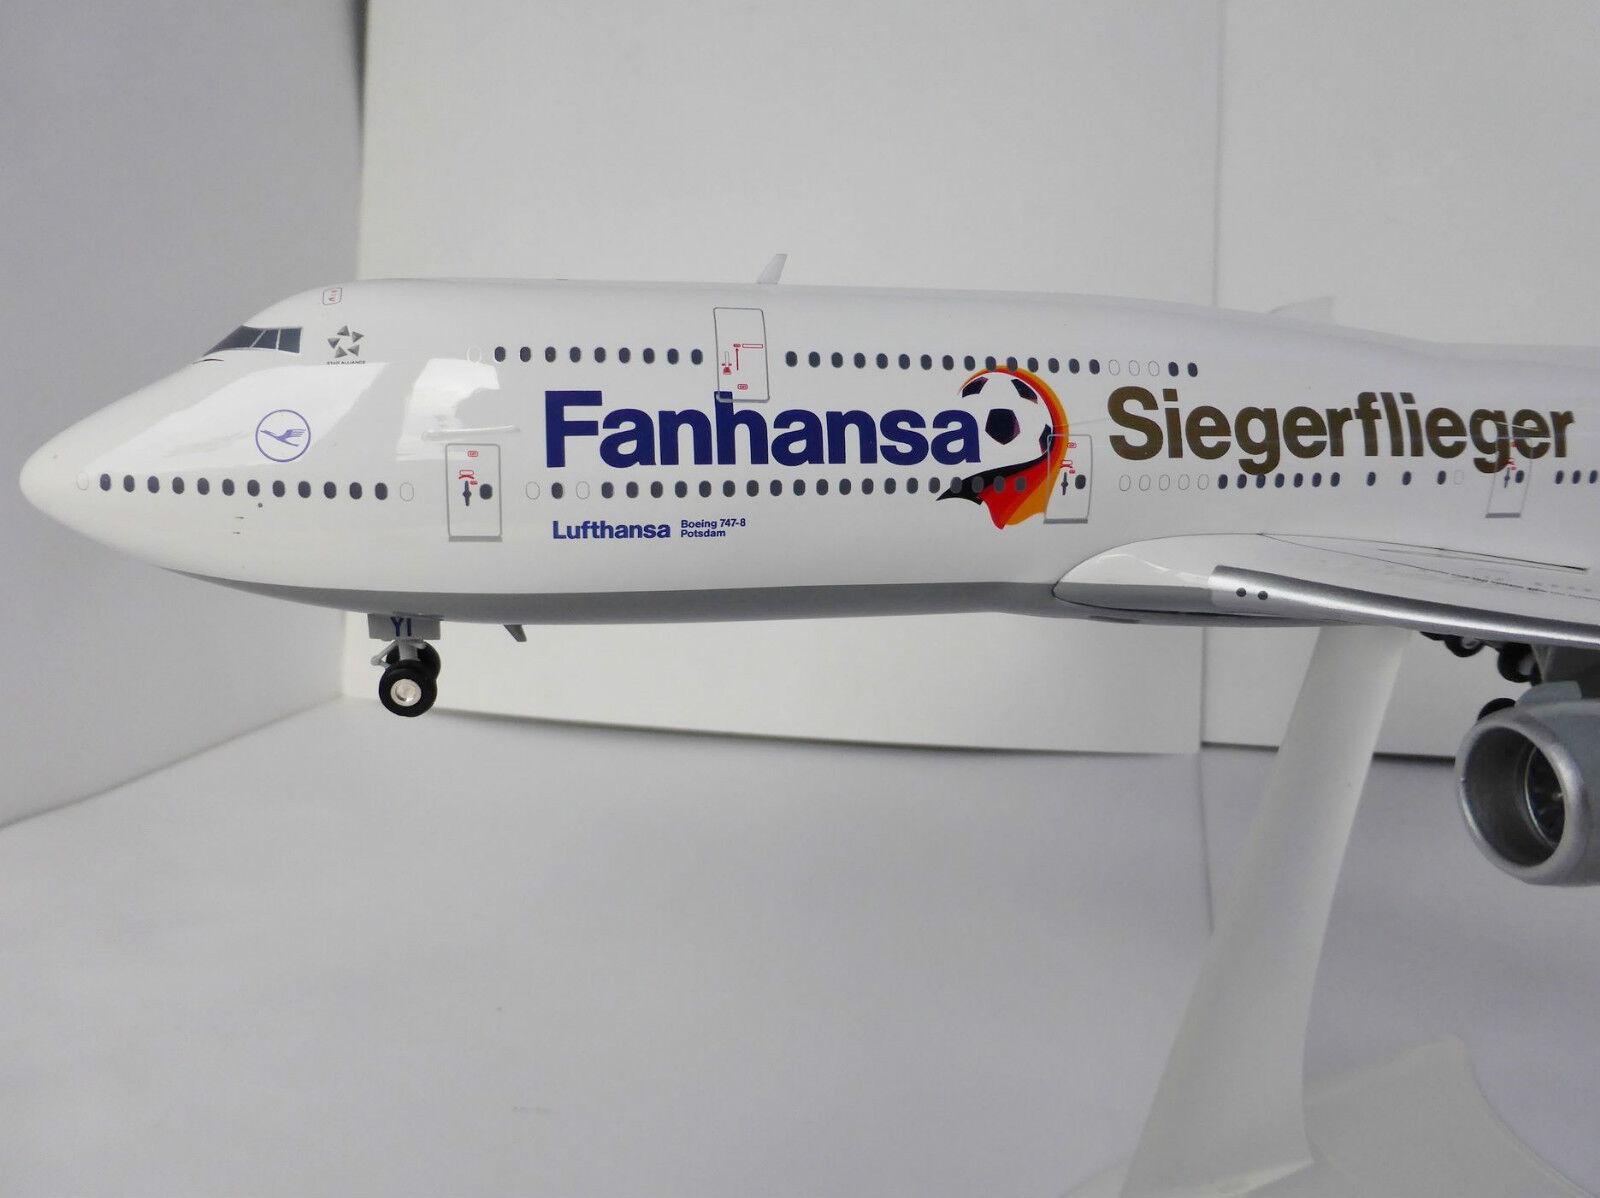 Vincitore aviatori fanhansa Boeing 747-8 Lufthansa 1/200 Herpa 556767 747 WM